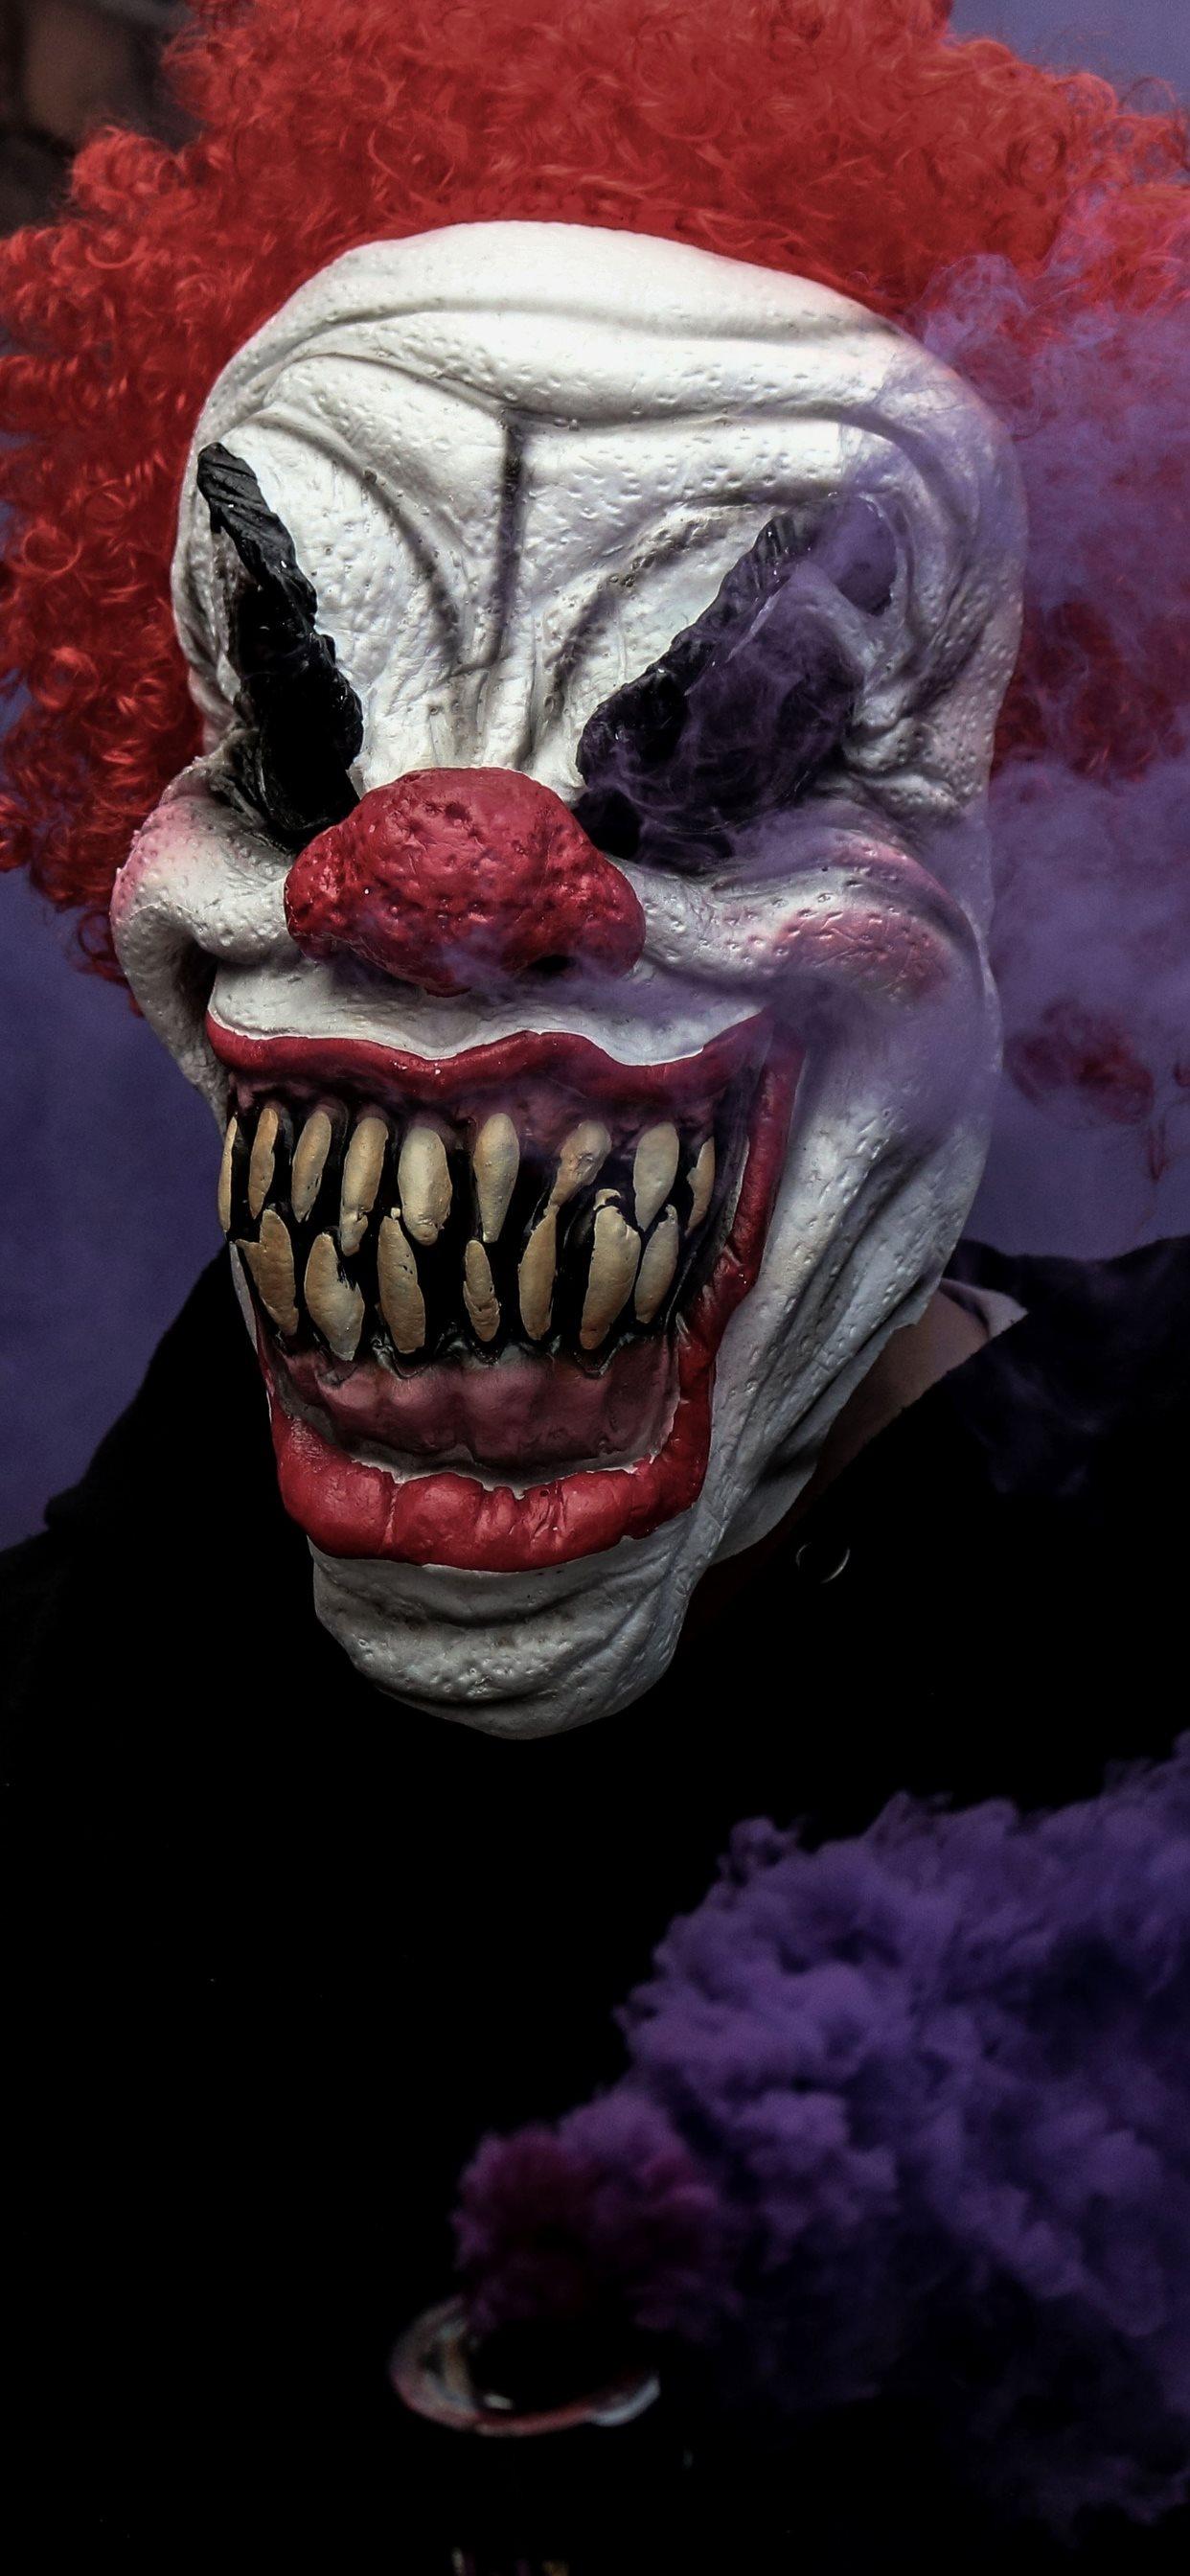 Halloween Mask 5k Iphone X Wallpapers Free Download